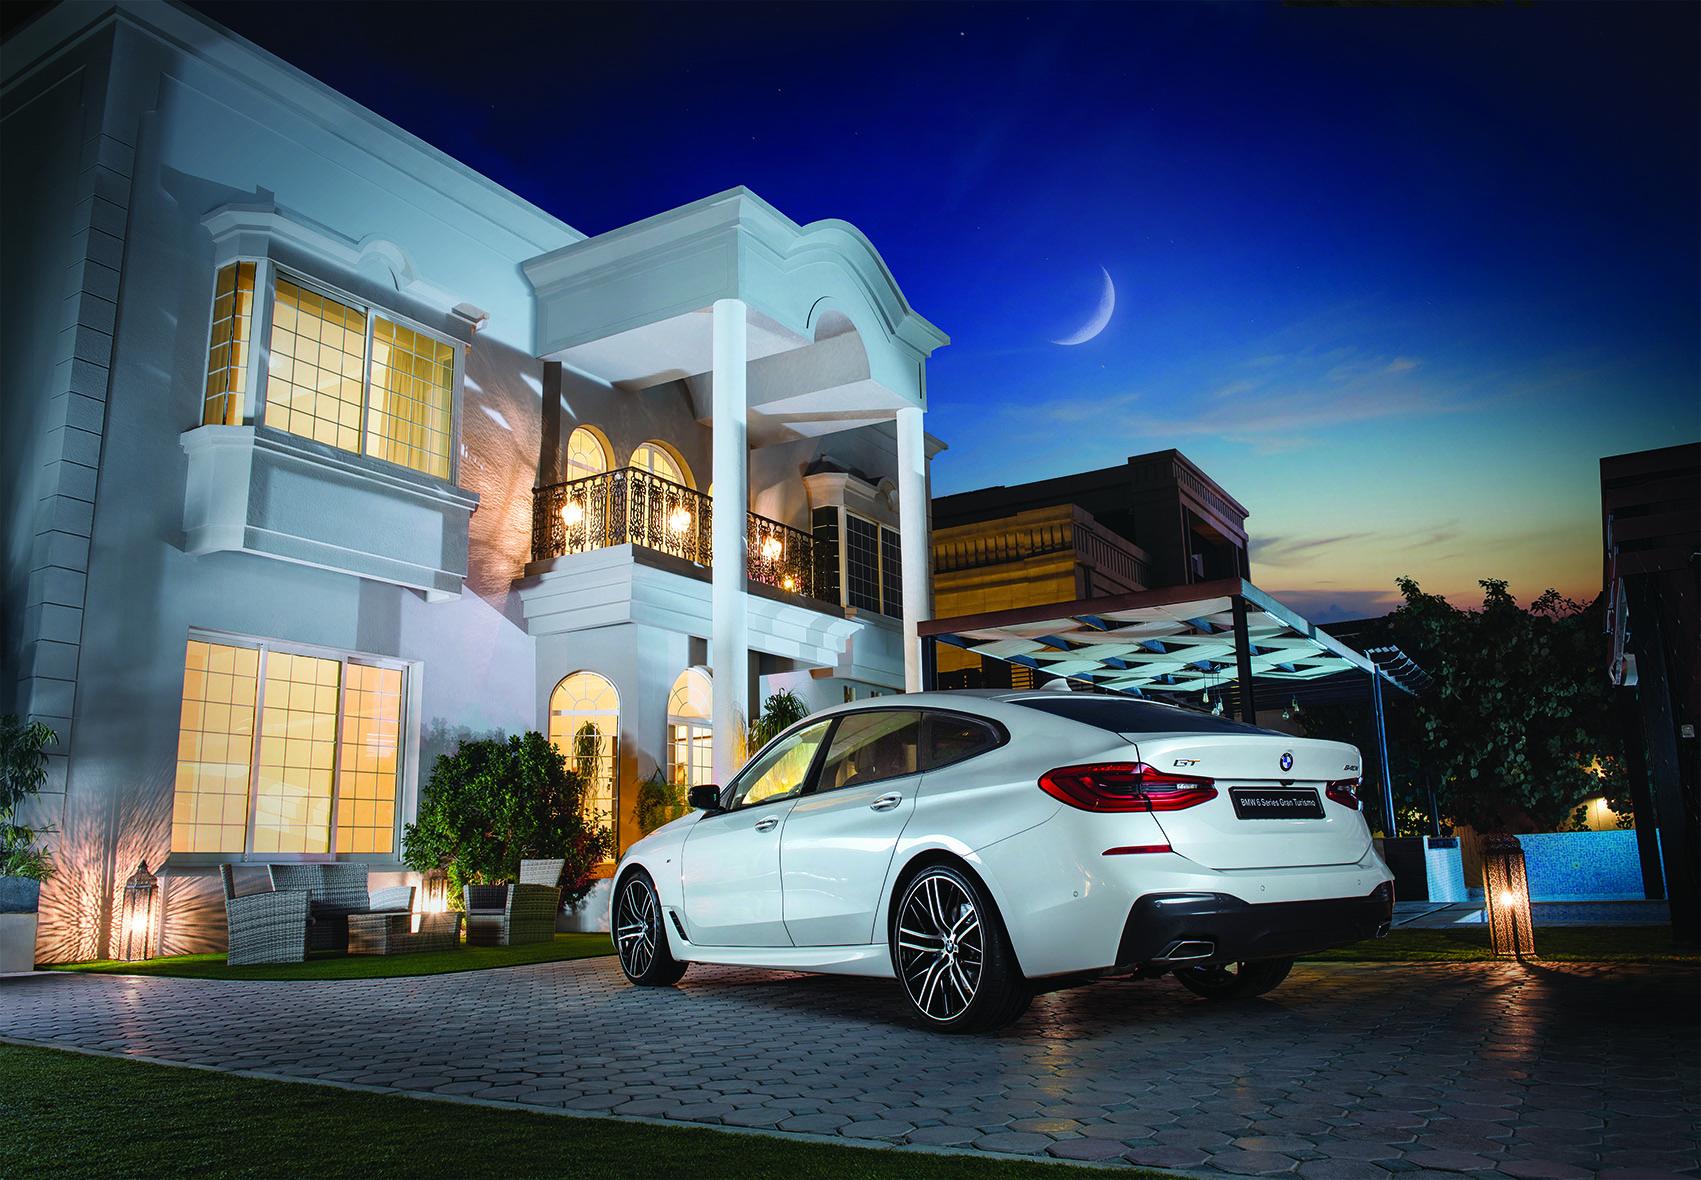 AG 001 BMW 6 Series Gran Turismo-LCH_8870-CL.jpg